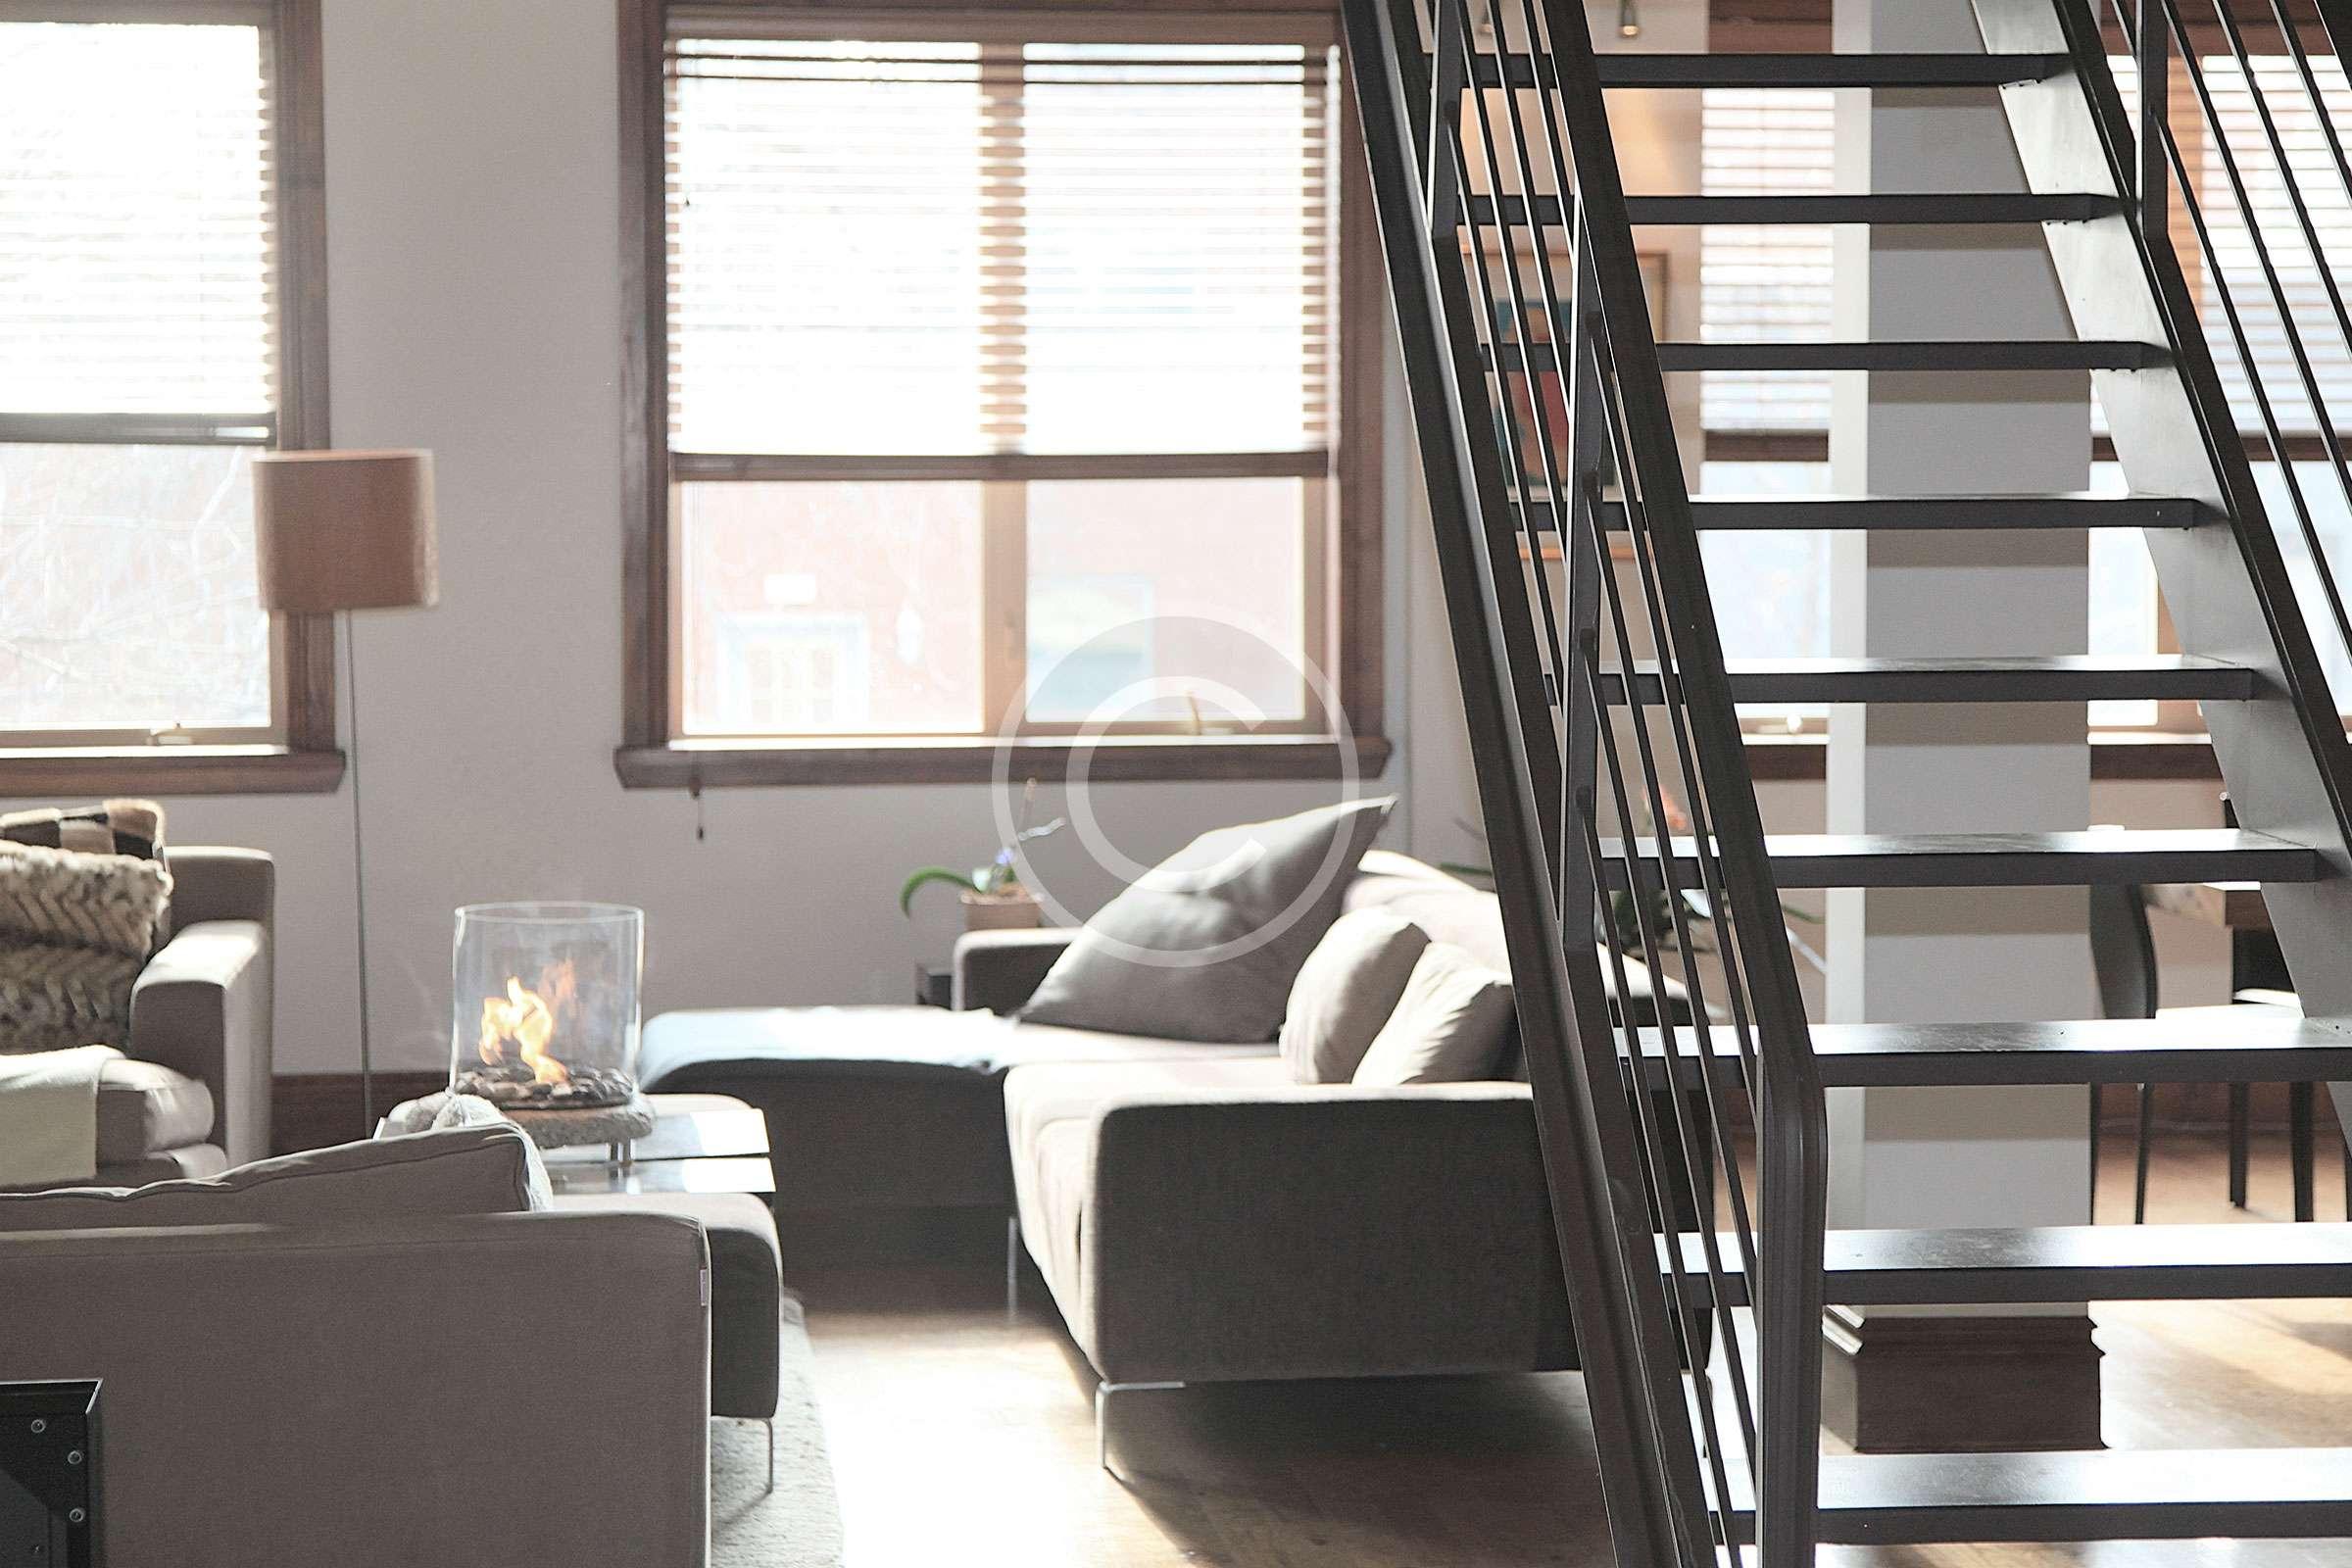 Types of Interior Paint Finish